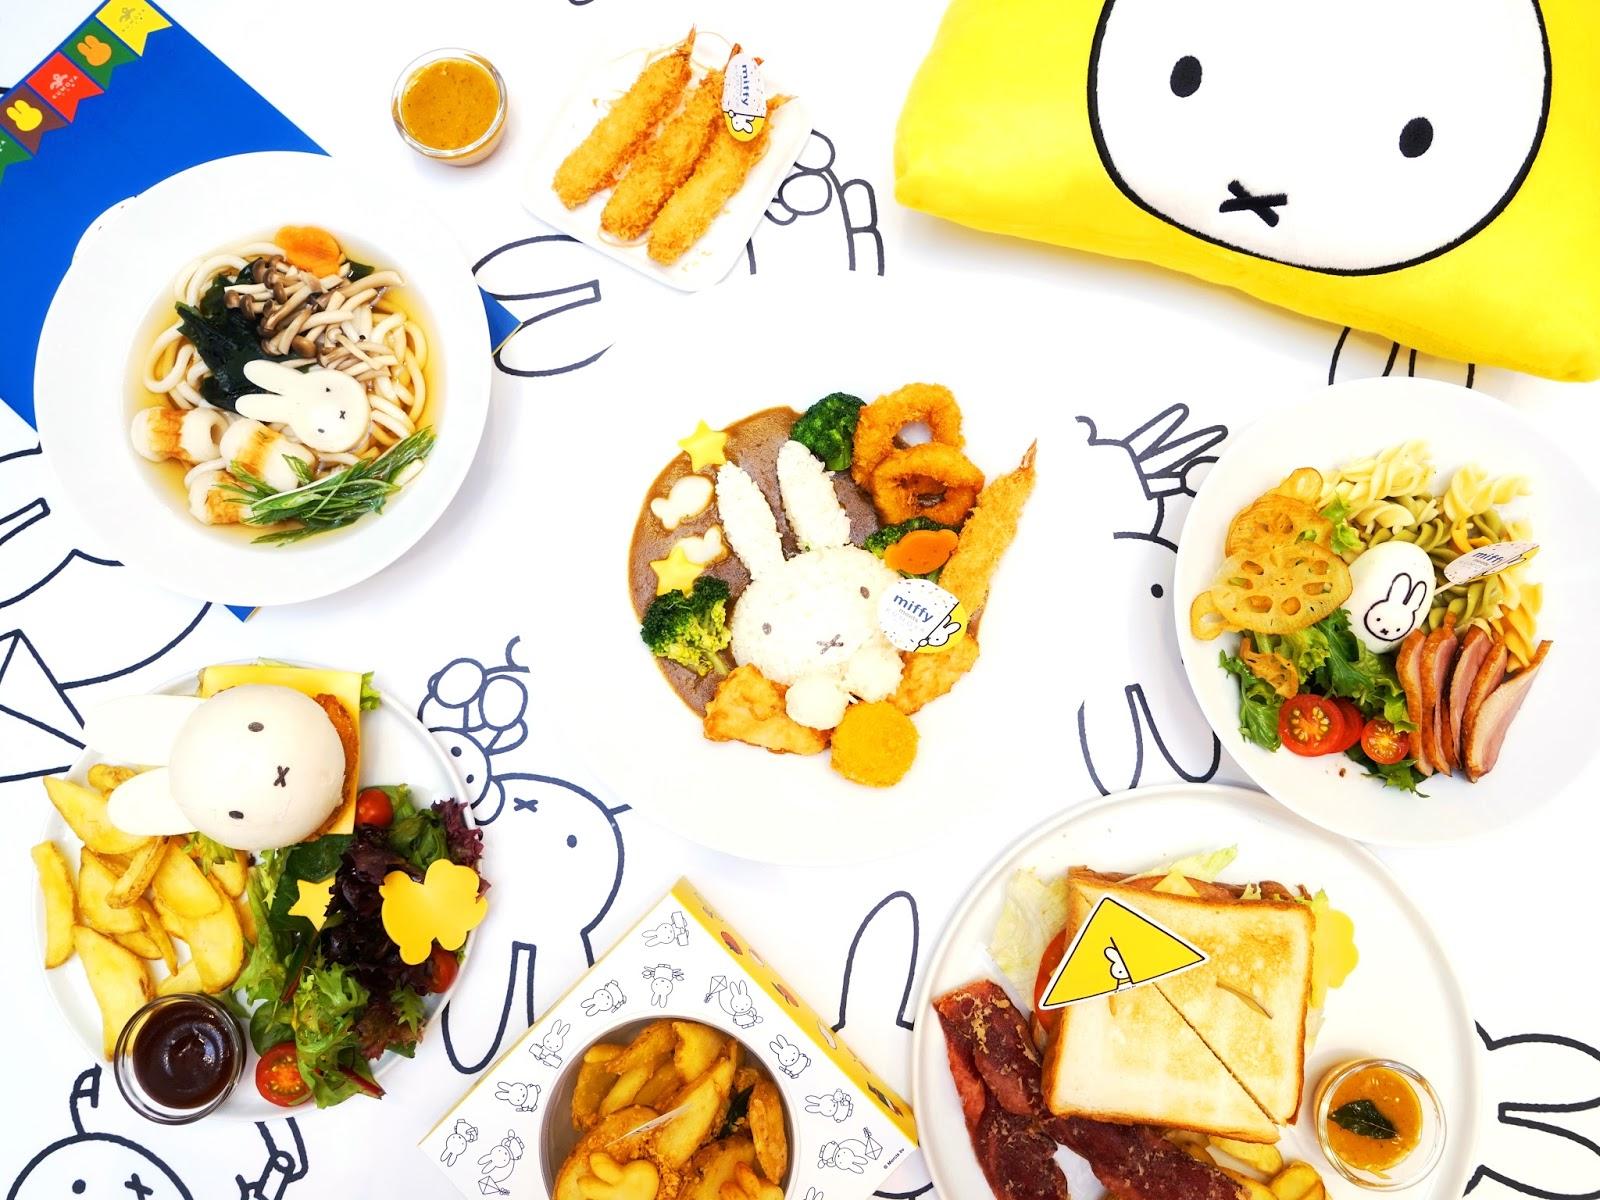 PinkyPiggu: Miffy Meets Kumoya! The Halal-Certified Japanese-French